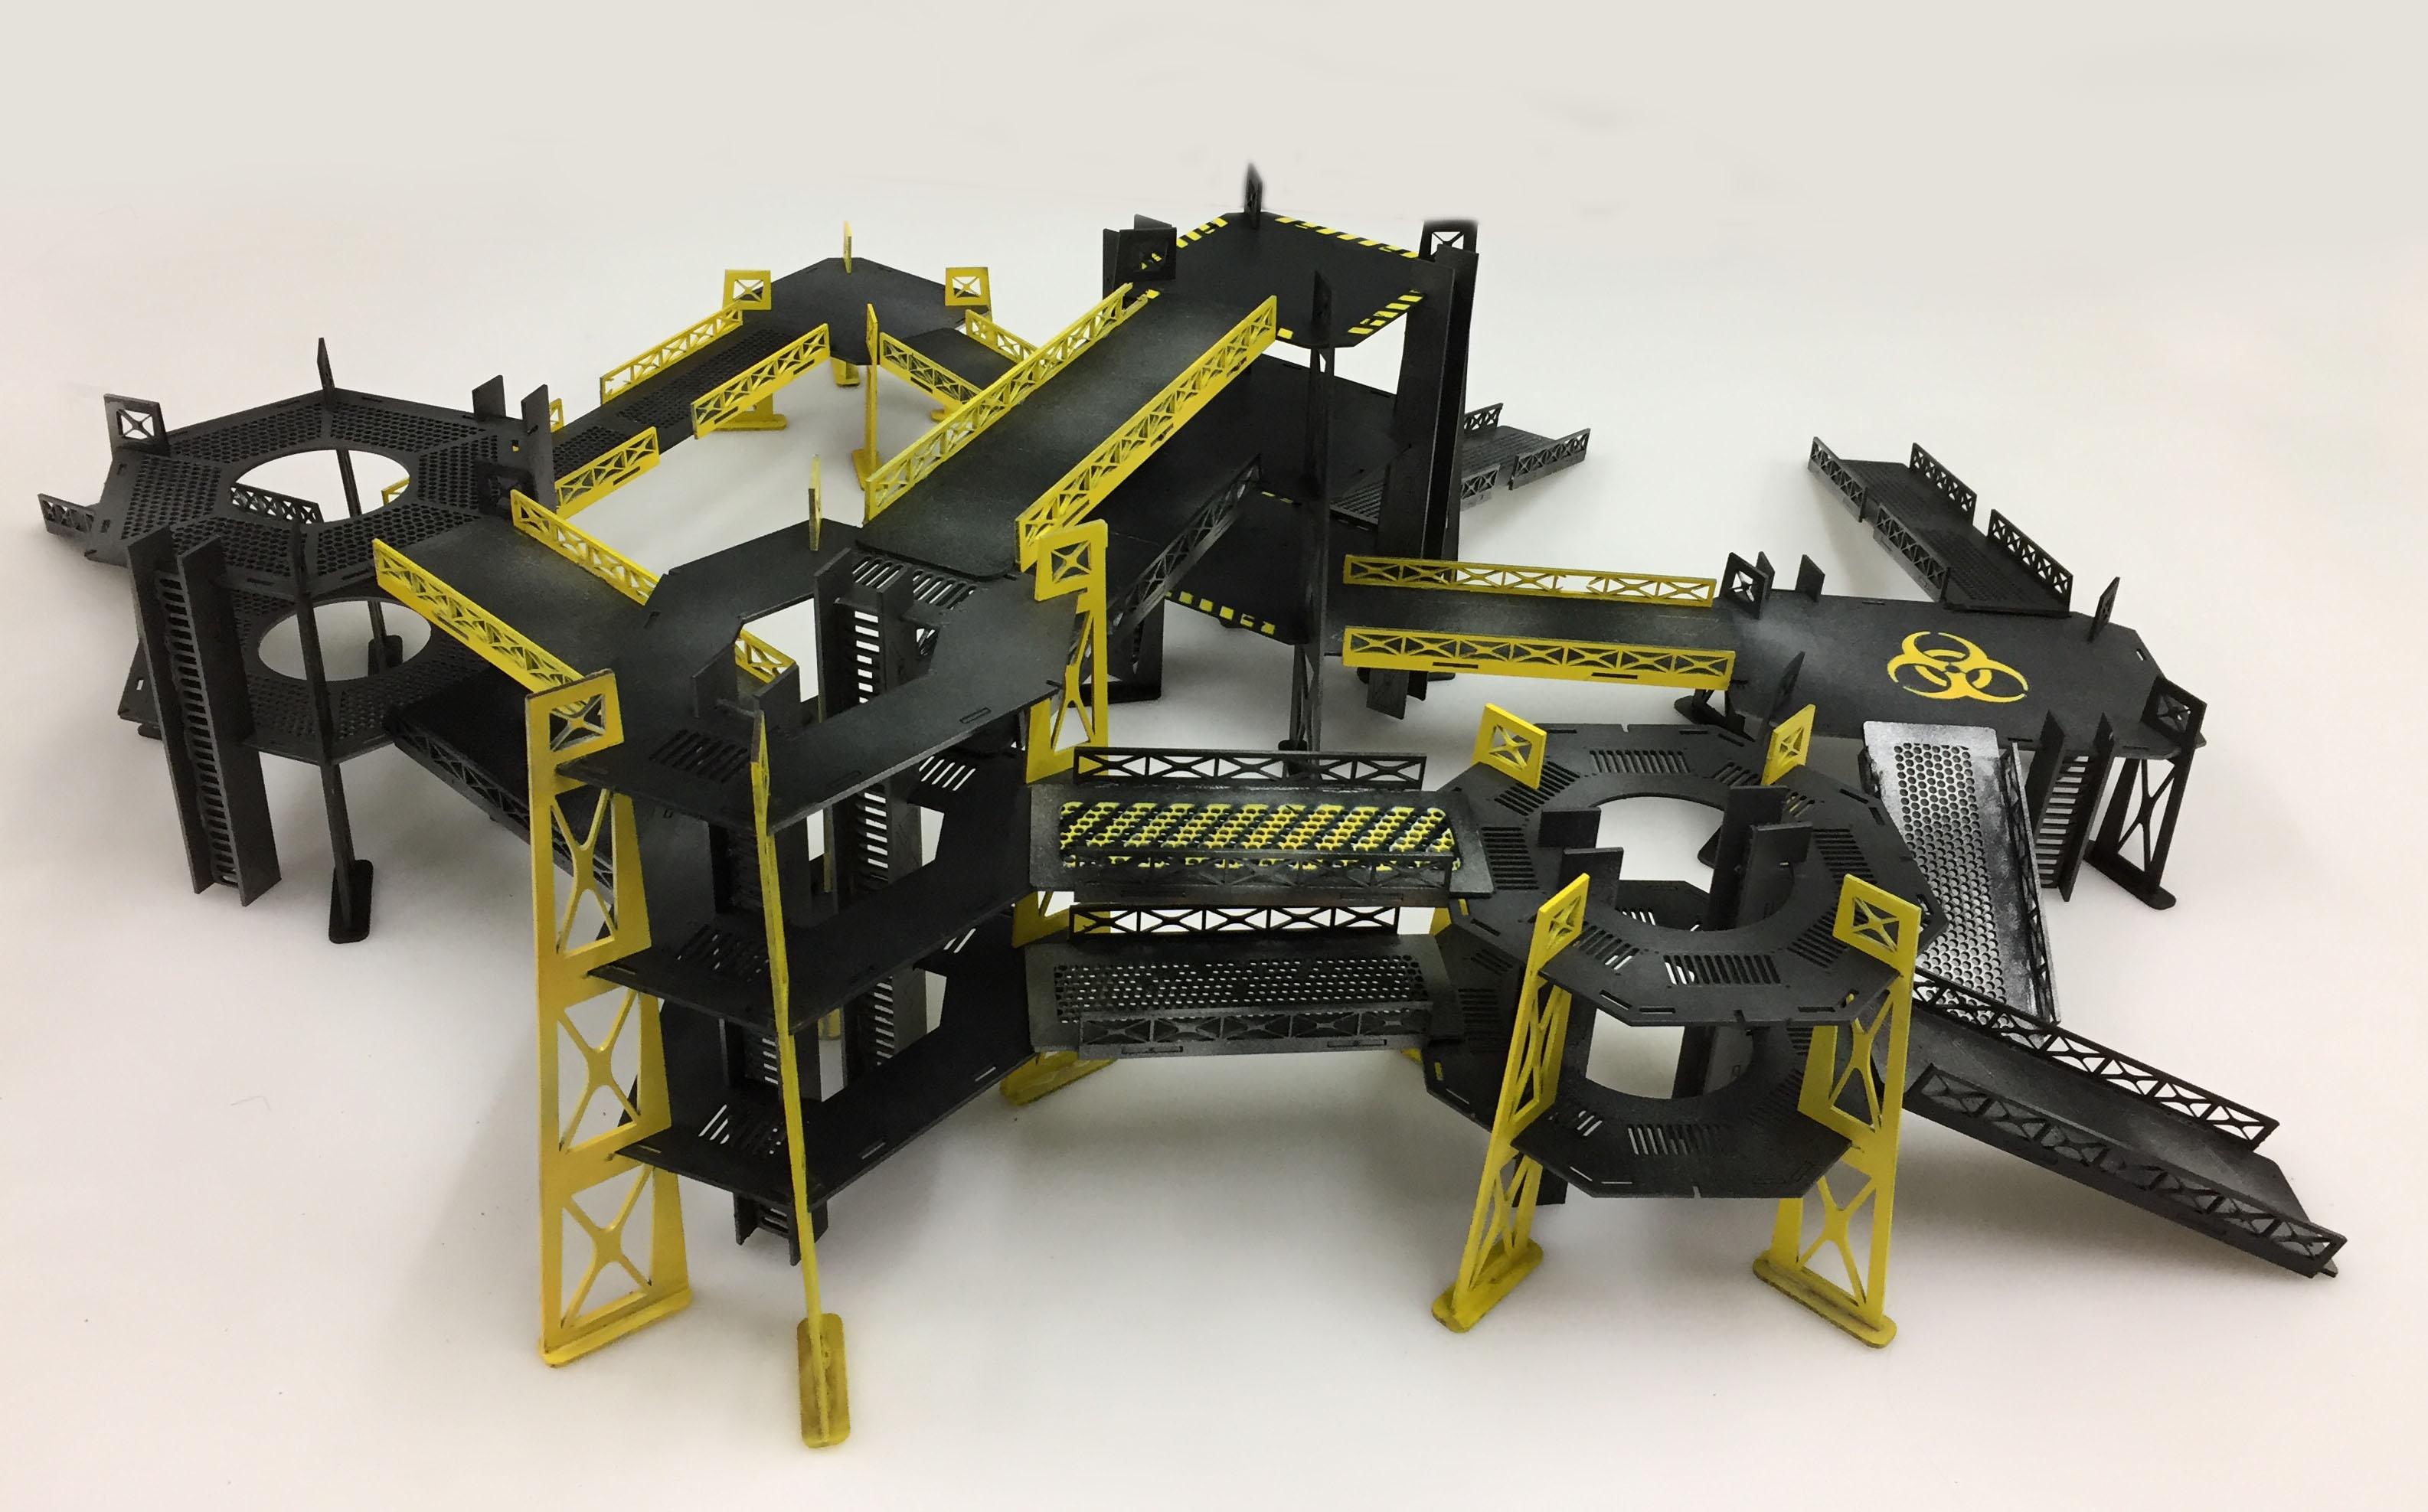 Industrial Terrain Set, Built and Painted Set | Wargames